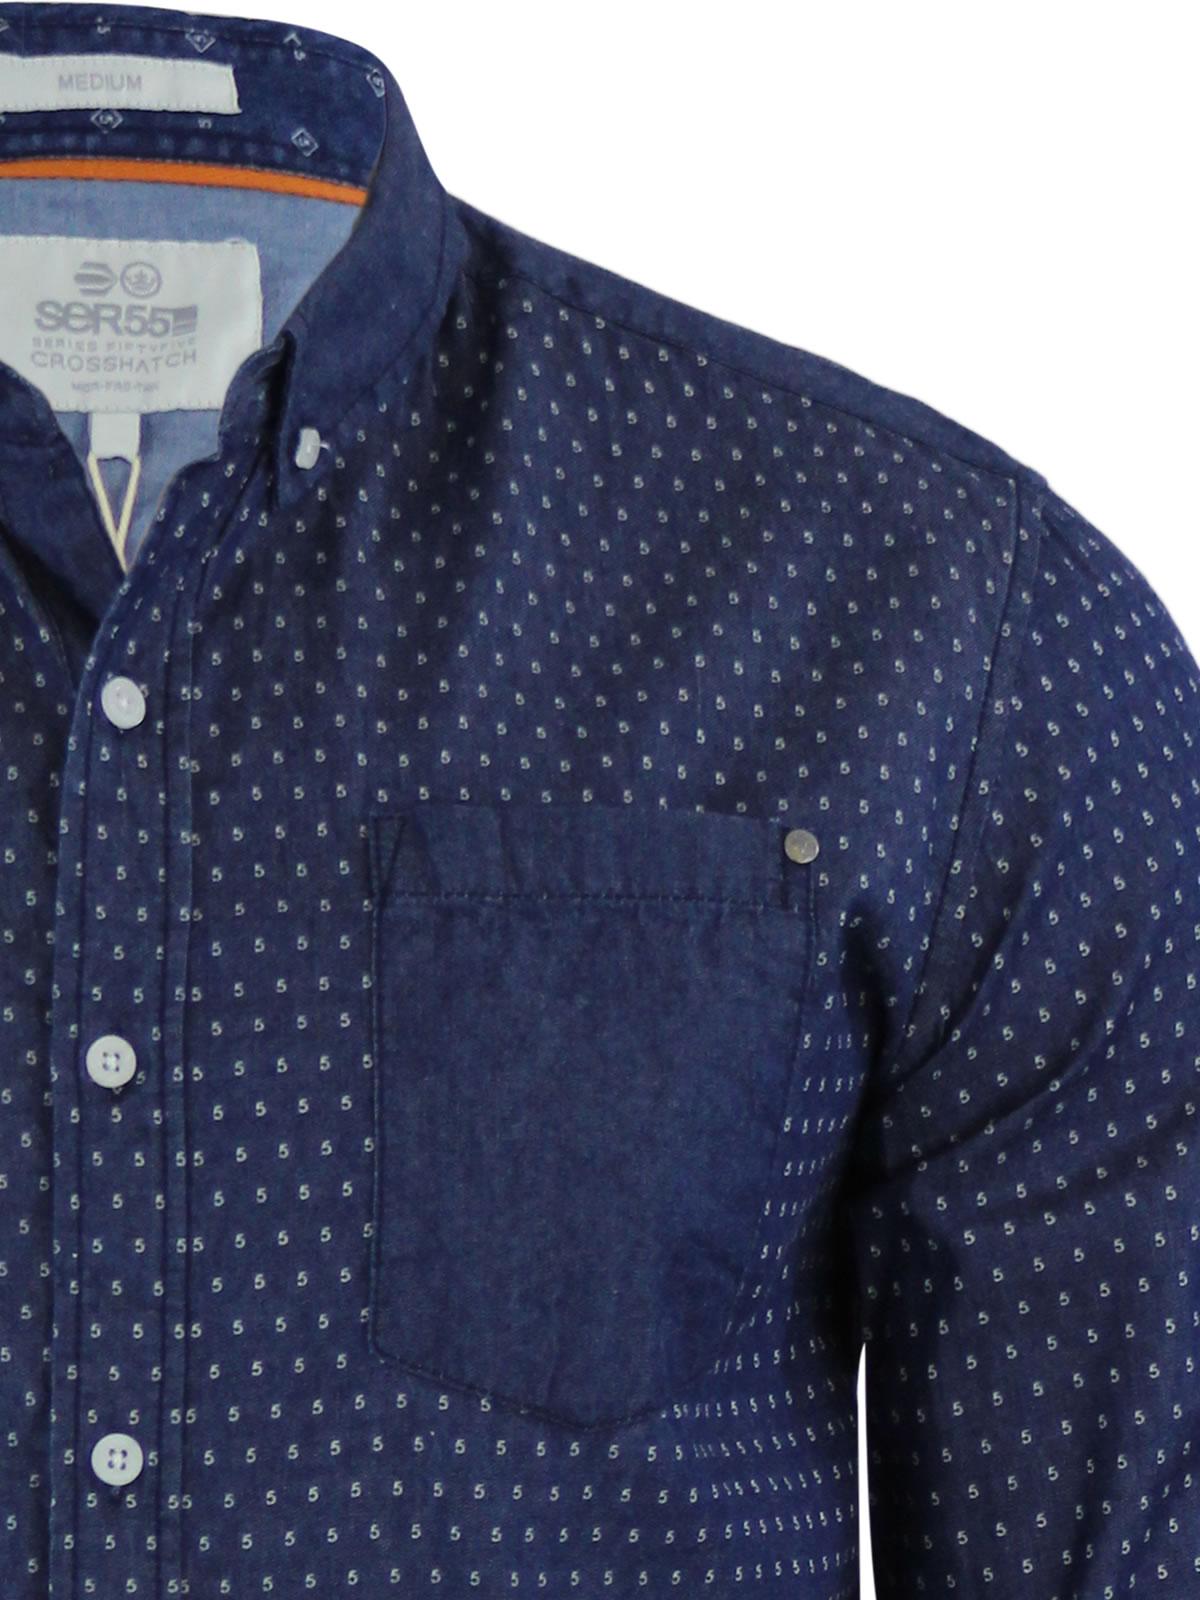 Mens-Denim-Shirt-Crosshatch-Plantain-Cotton-Long-Sleeve-Collared-Casual-Top